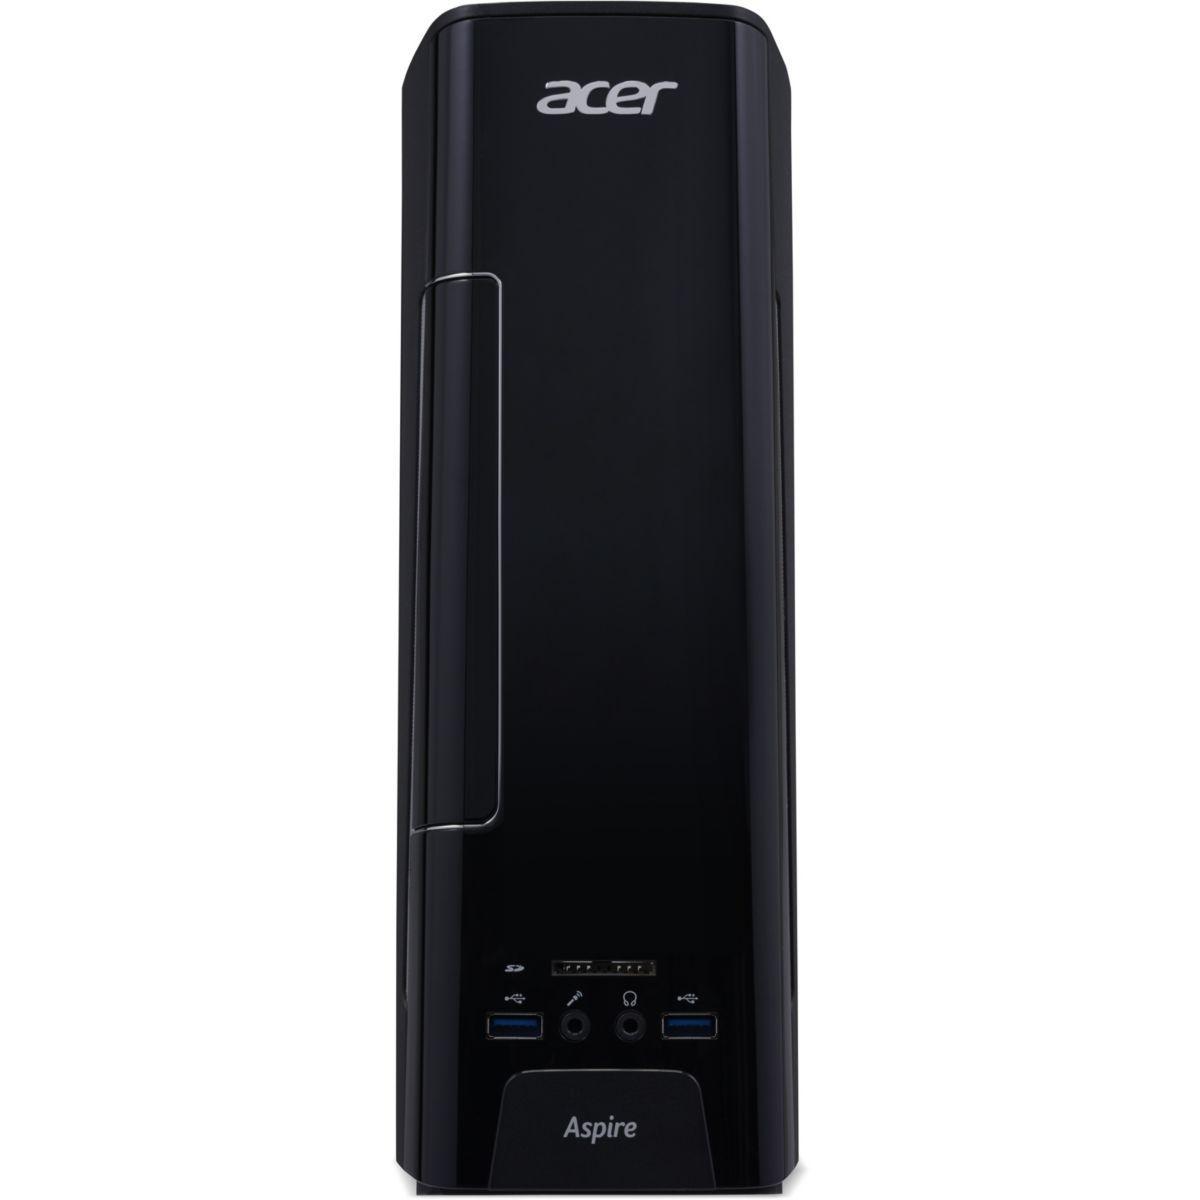 Ordi ACER Aspire AXC-730